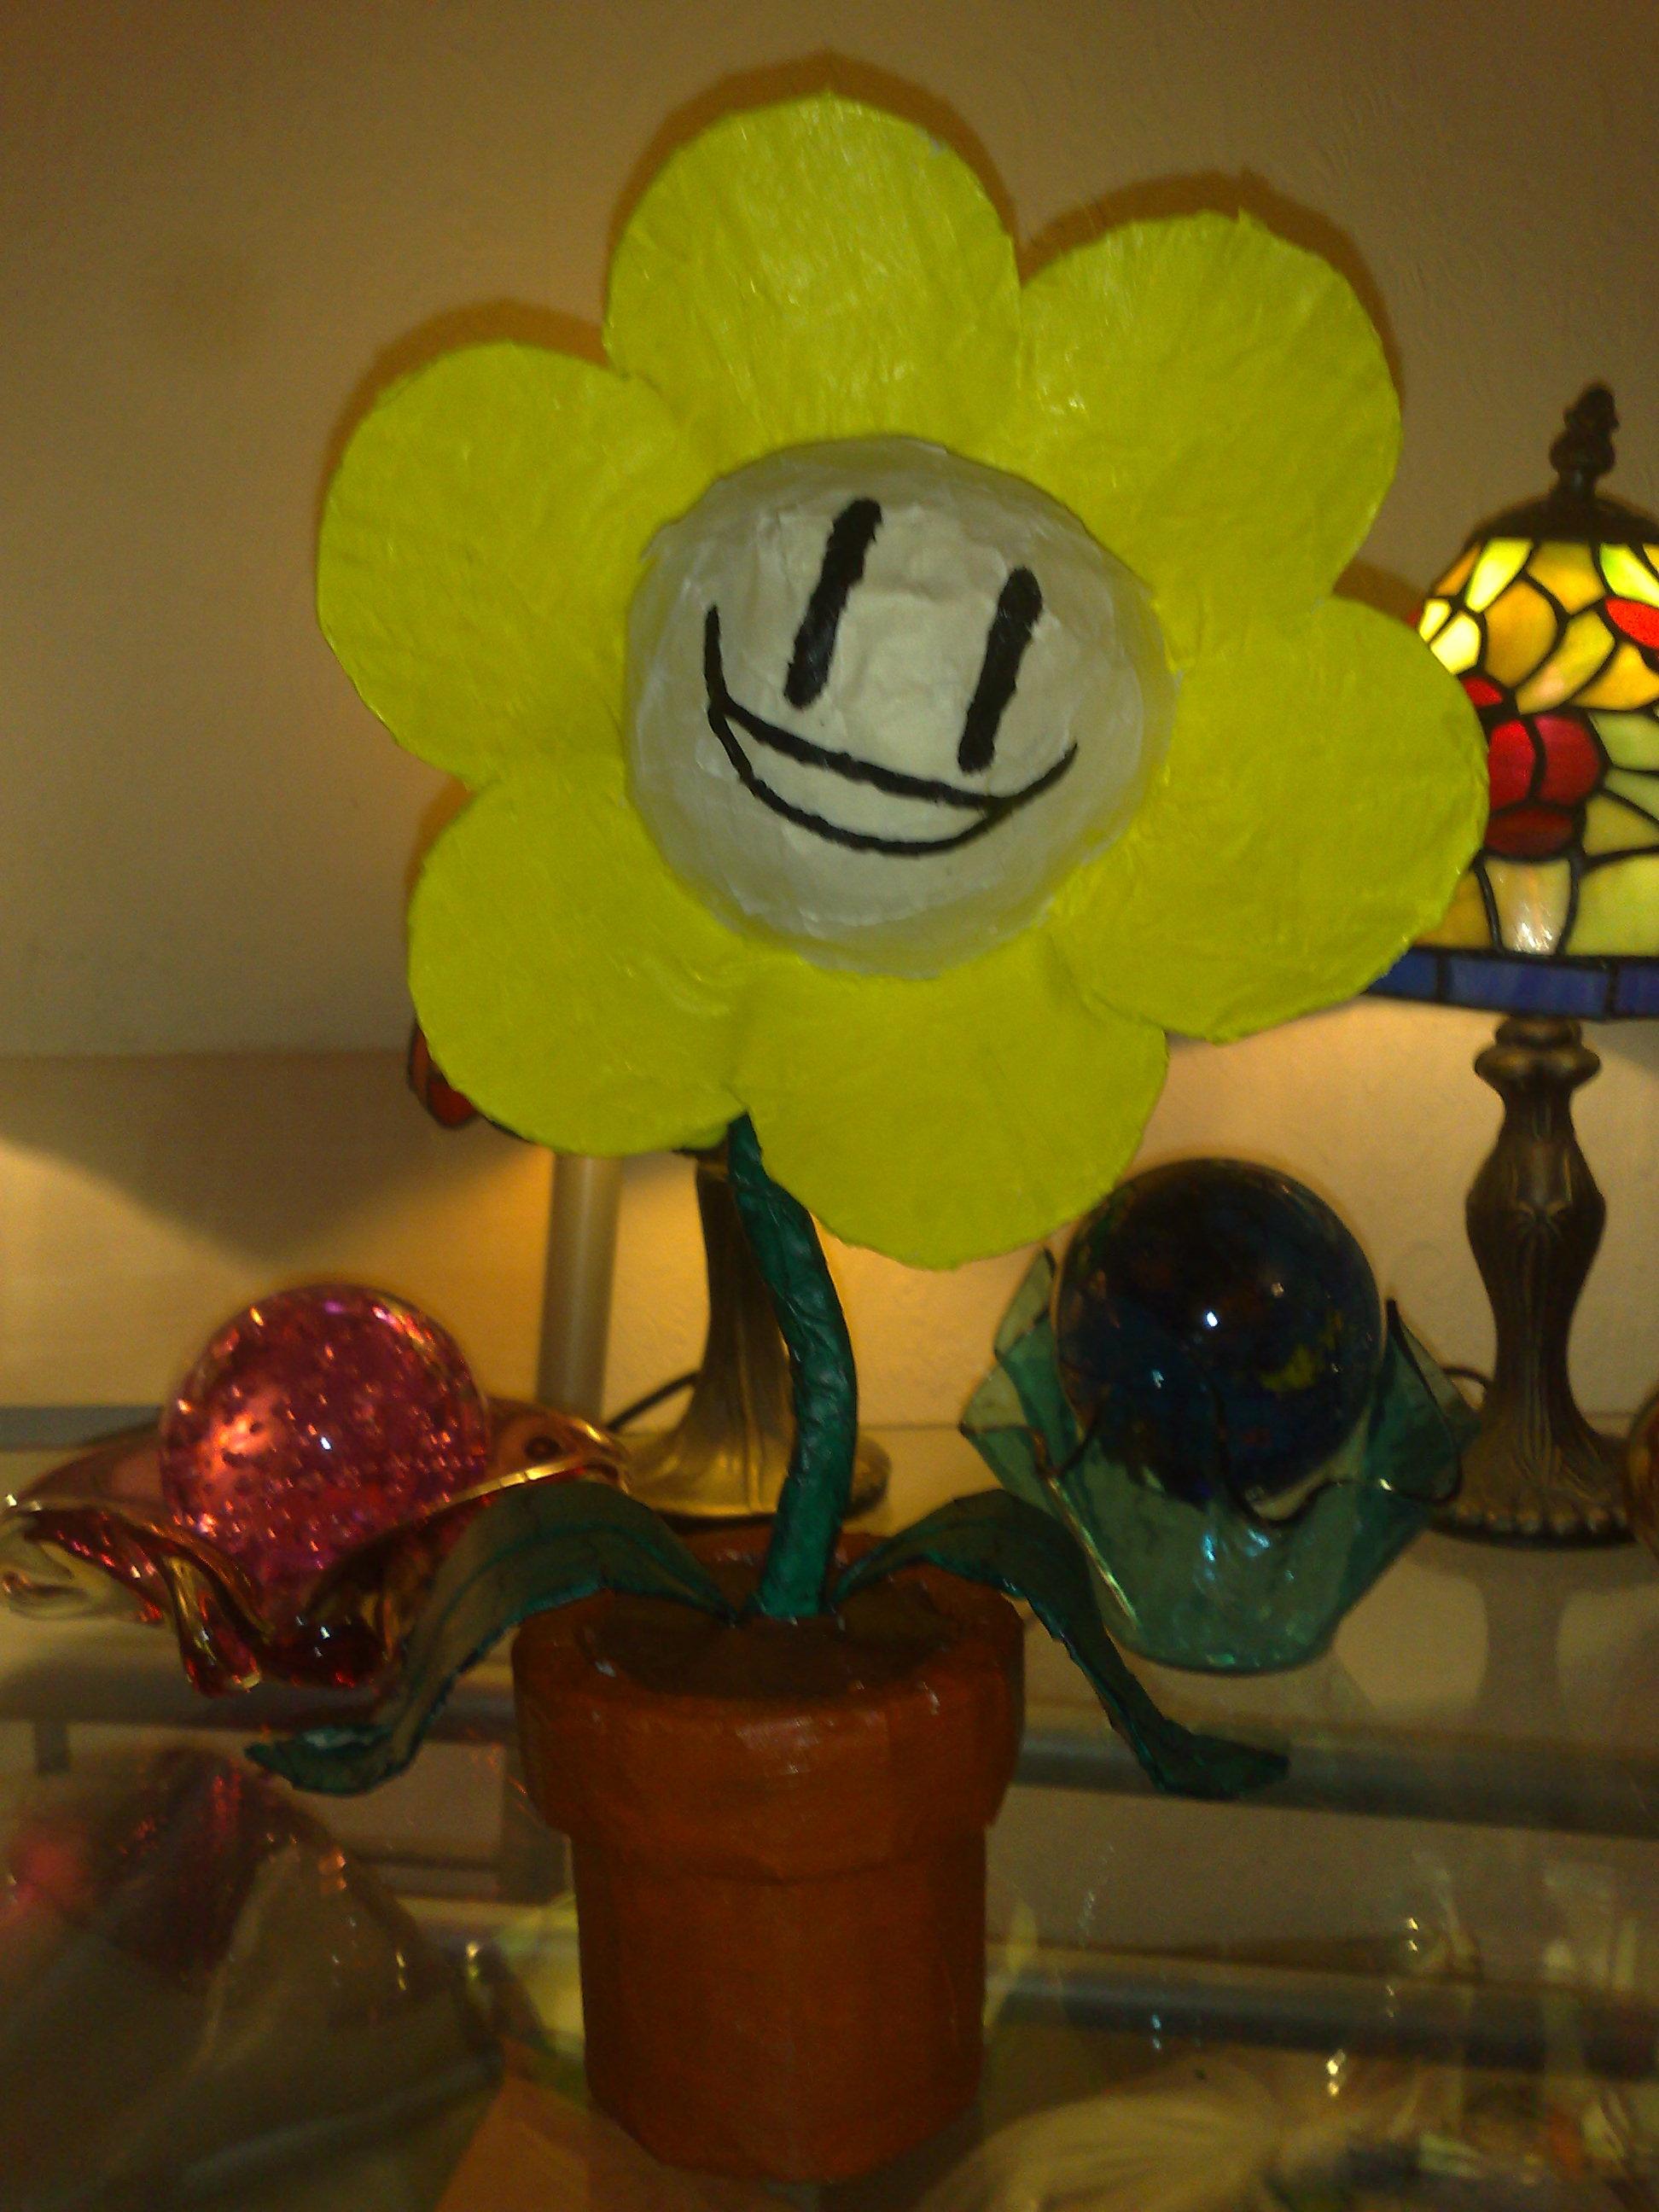 Howdy I m FLOWEY FLOWEY the FLOWER by daisy mai 5157 on DeviantArt